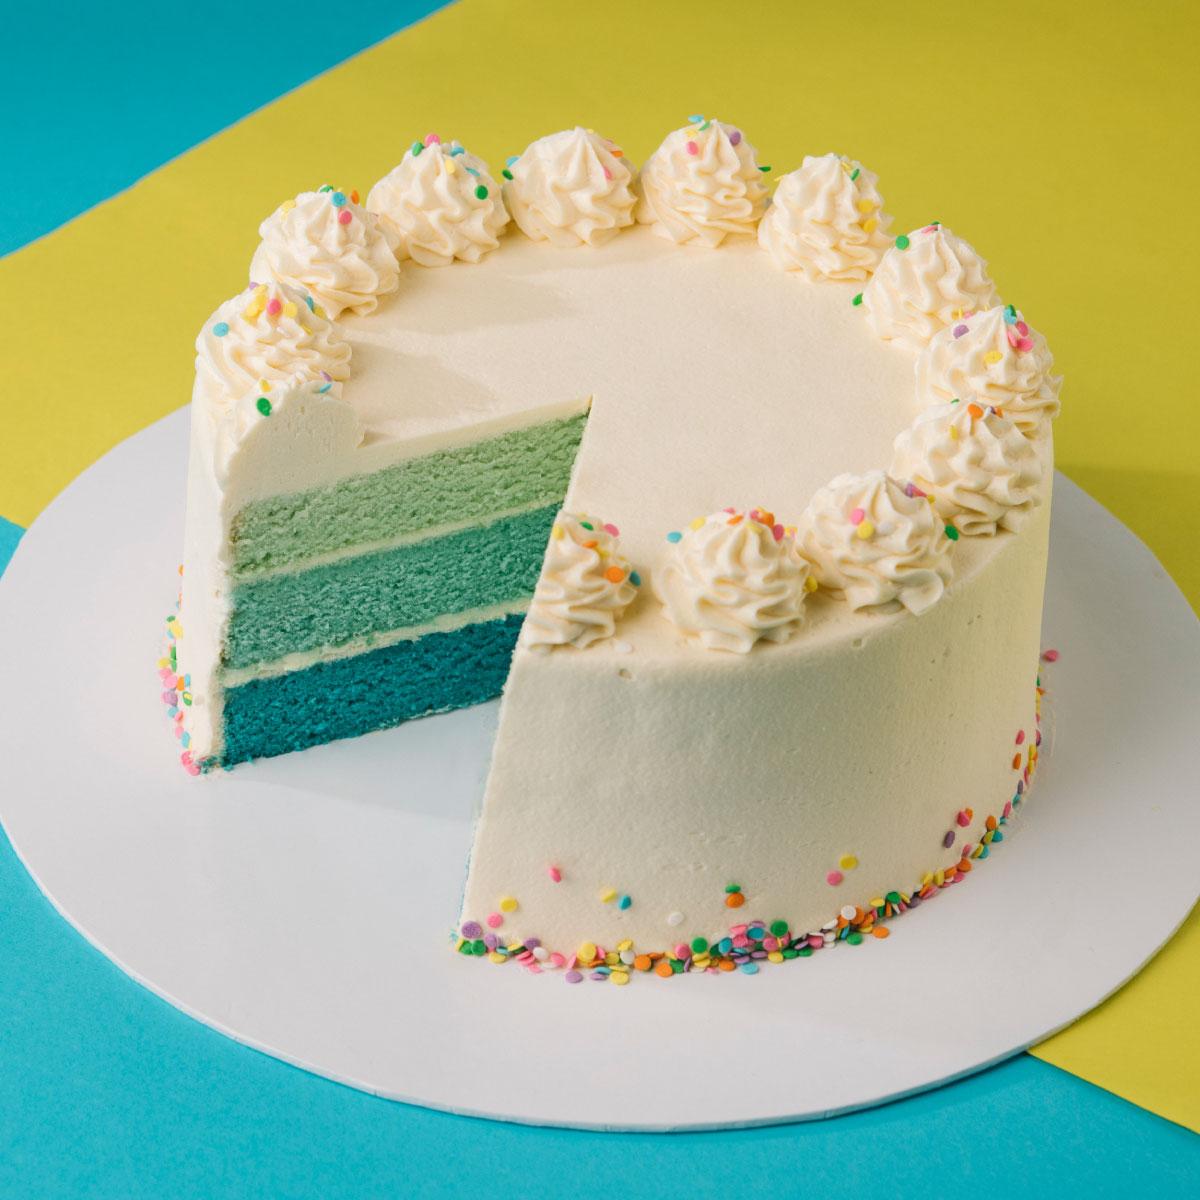 Ribbon Cake - 1Kg